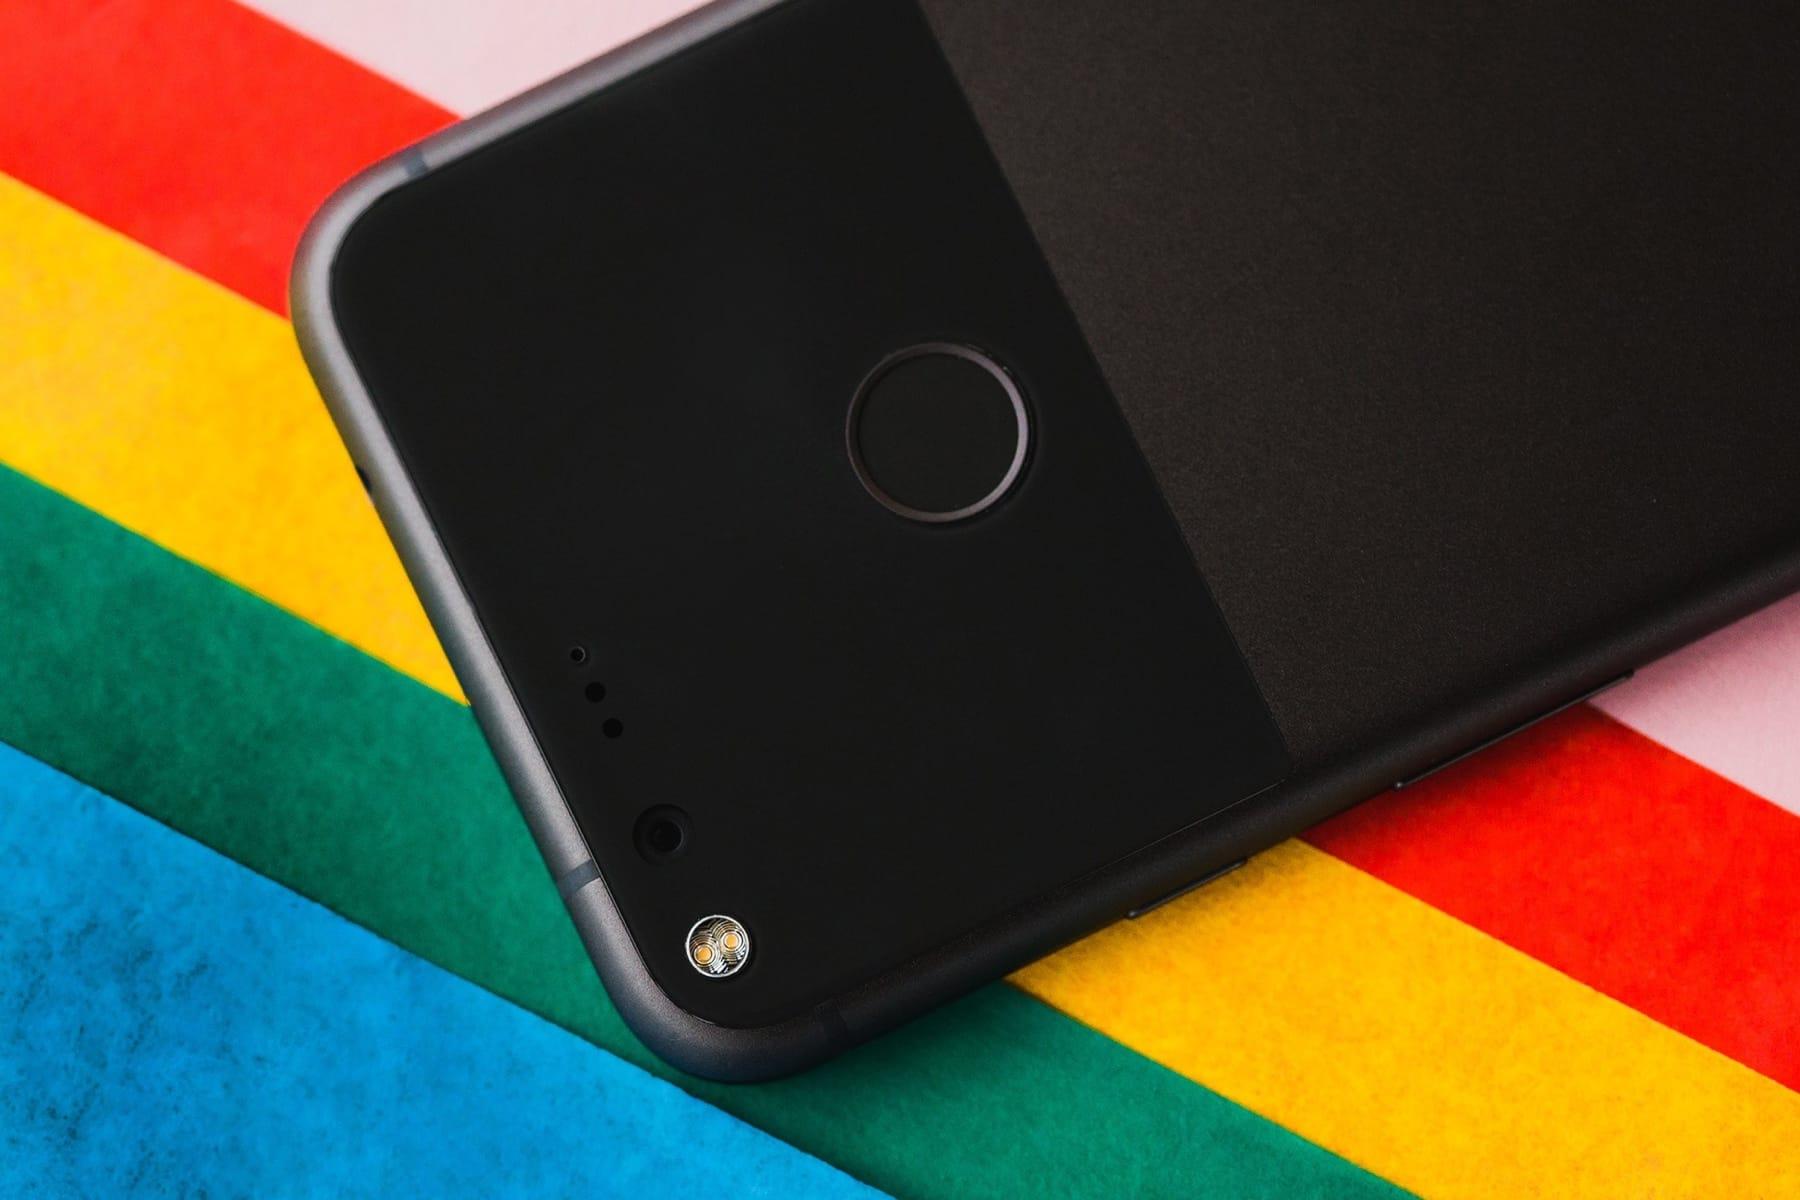 http://akket.com/wp-content/uploads/2017/06/Google-Pixel-XL-Russia-USA-Price-000.jpg